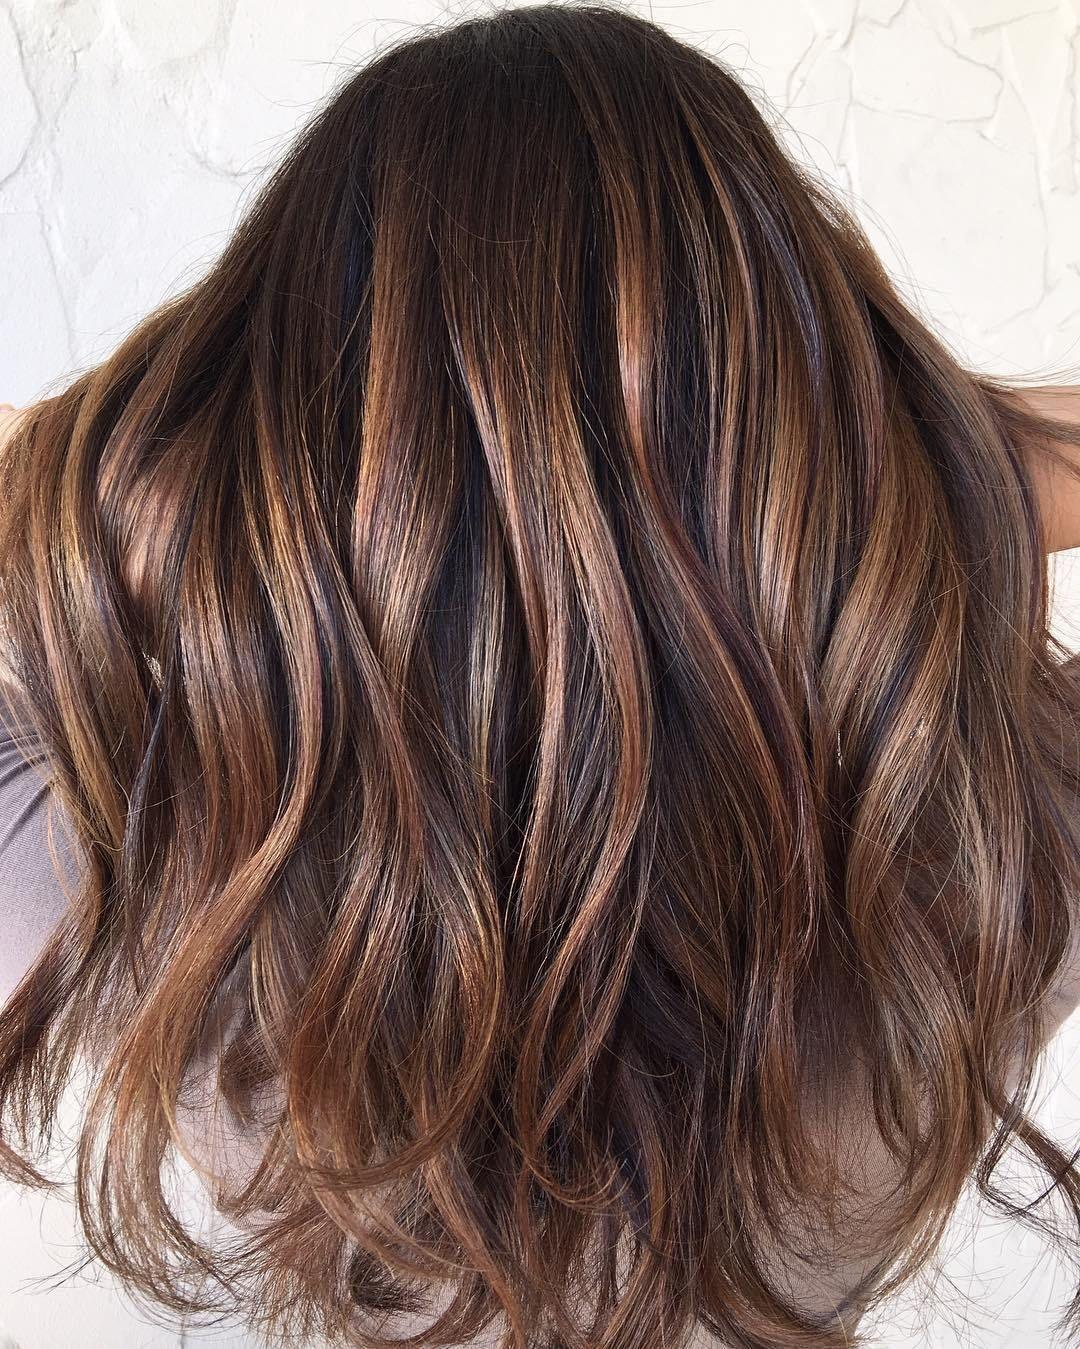 20 Tiger Eye Hair Ideas to Hold Onto | Balayage highlights ...